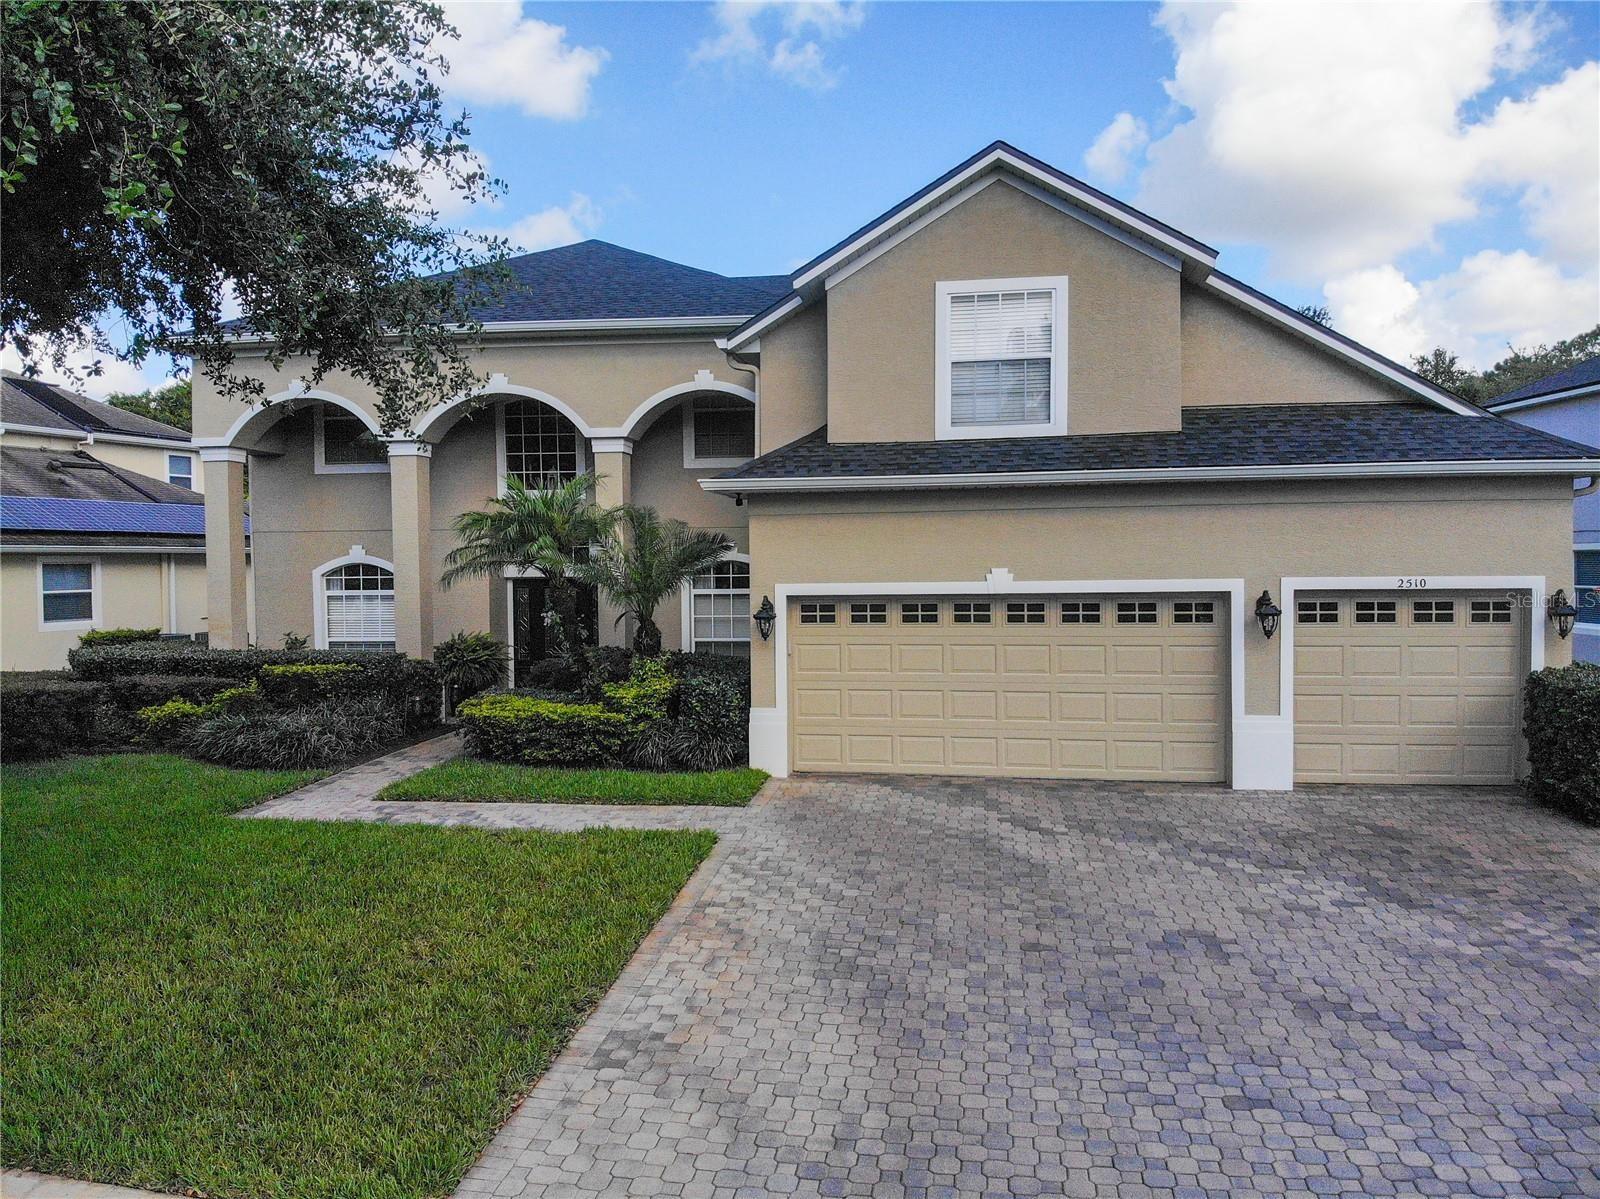 2510 WATER VALLEY DRIVE, Saint Cloud, FL 34771 - #: S5053936